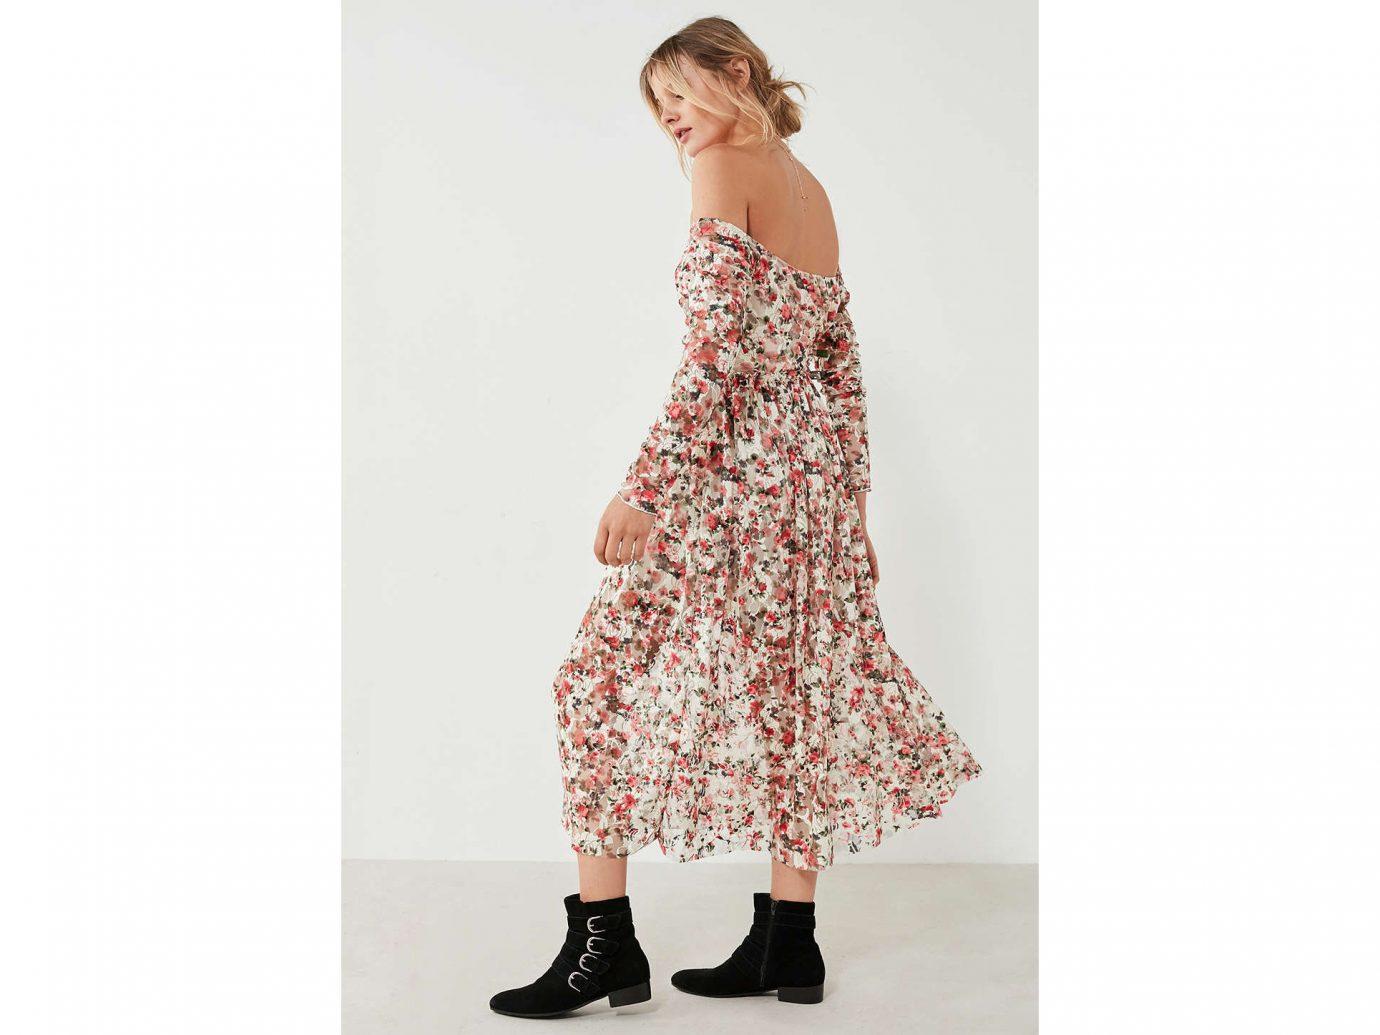 Fall Travel Style + Design Travel Shop Weekend Getaways clothing day dress dress fashion model shoulder girl joint neck pattern trunk waist shoe fashion design